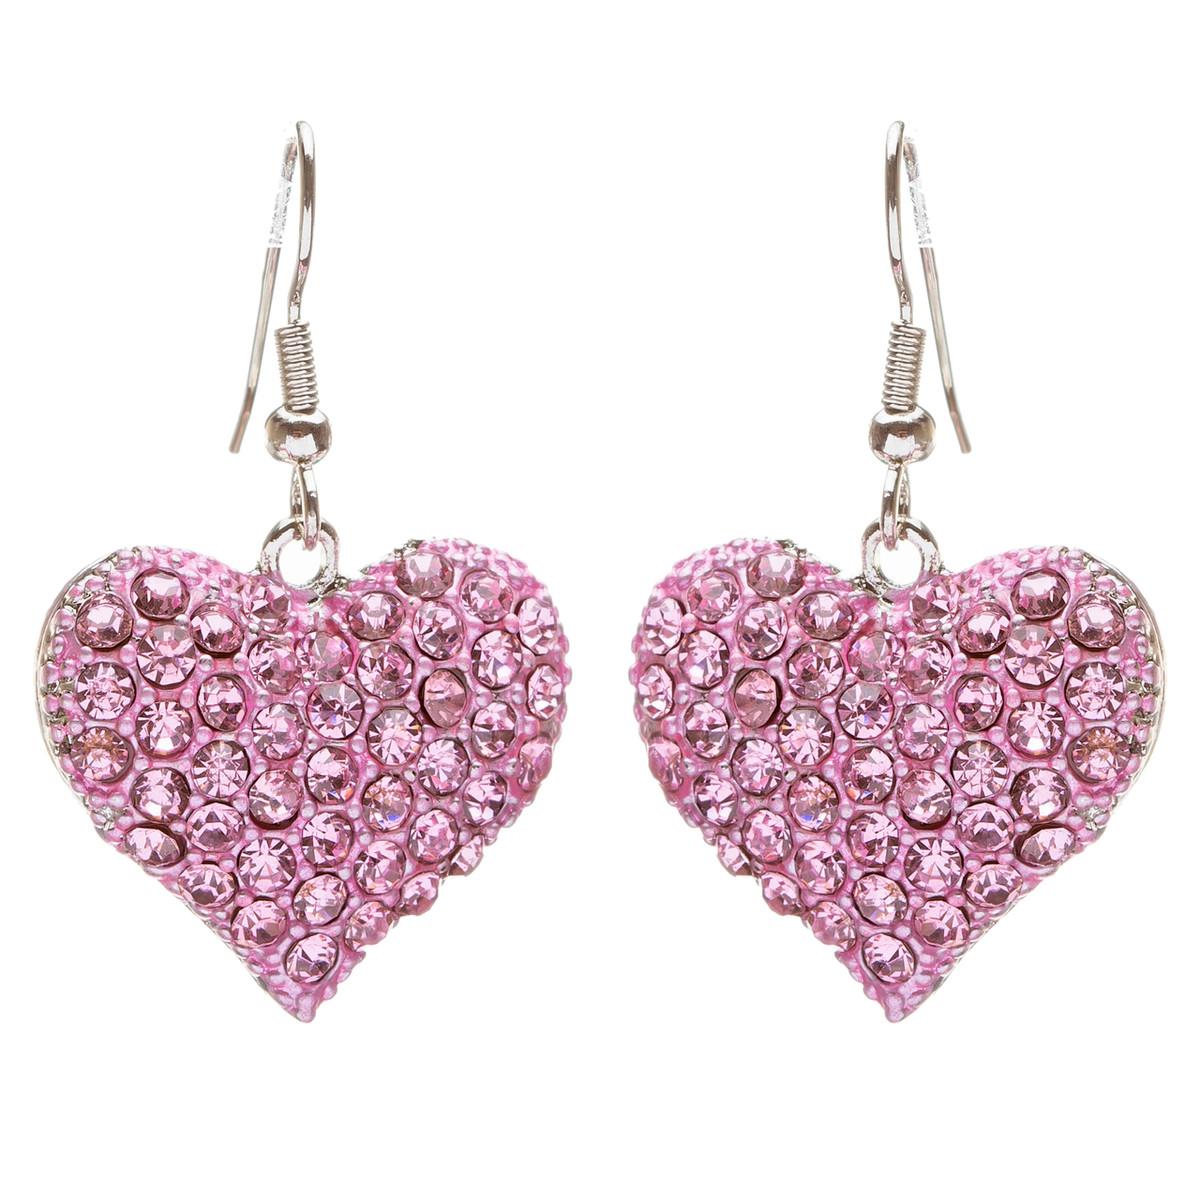 ACCESSORIESFOREVER | Lovely Sweet Beautiful Heart Shape Charm ...